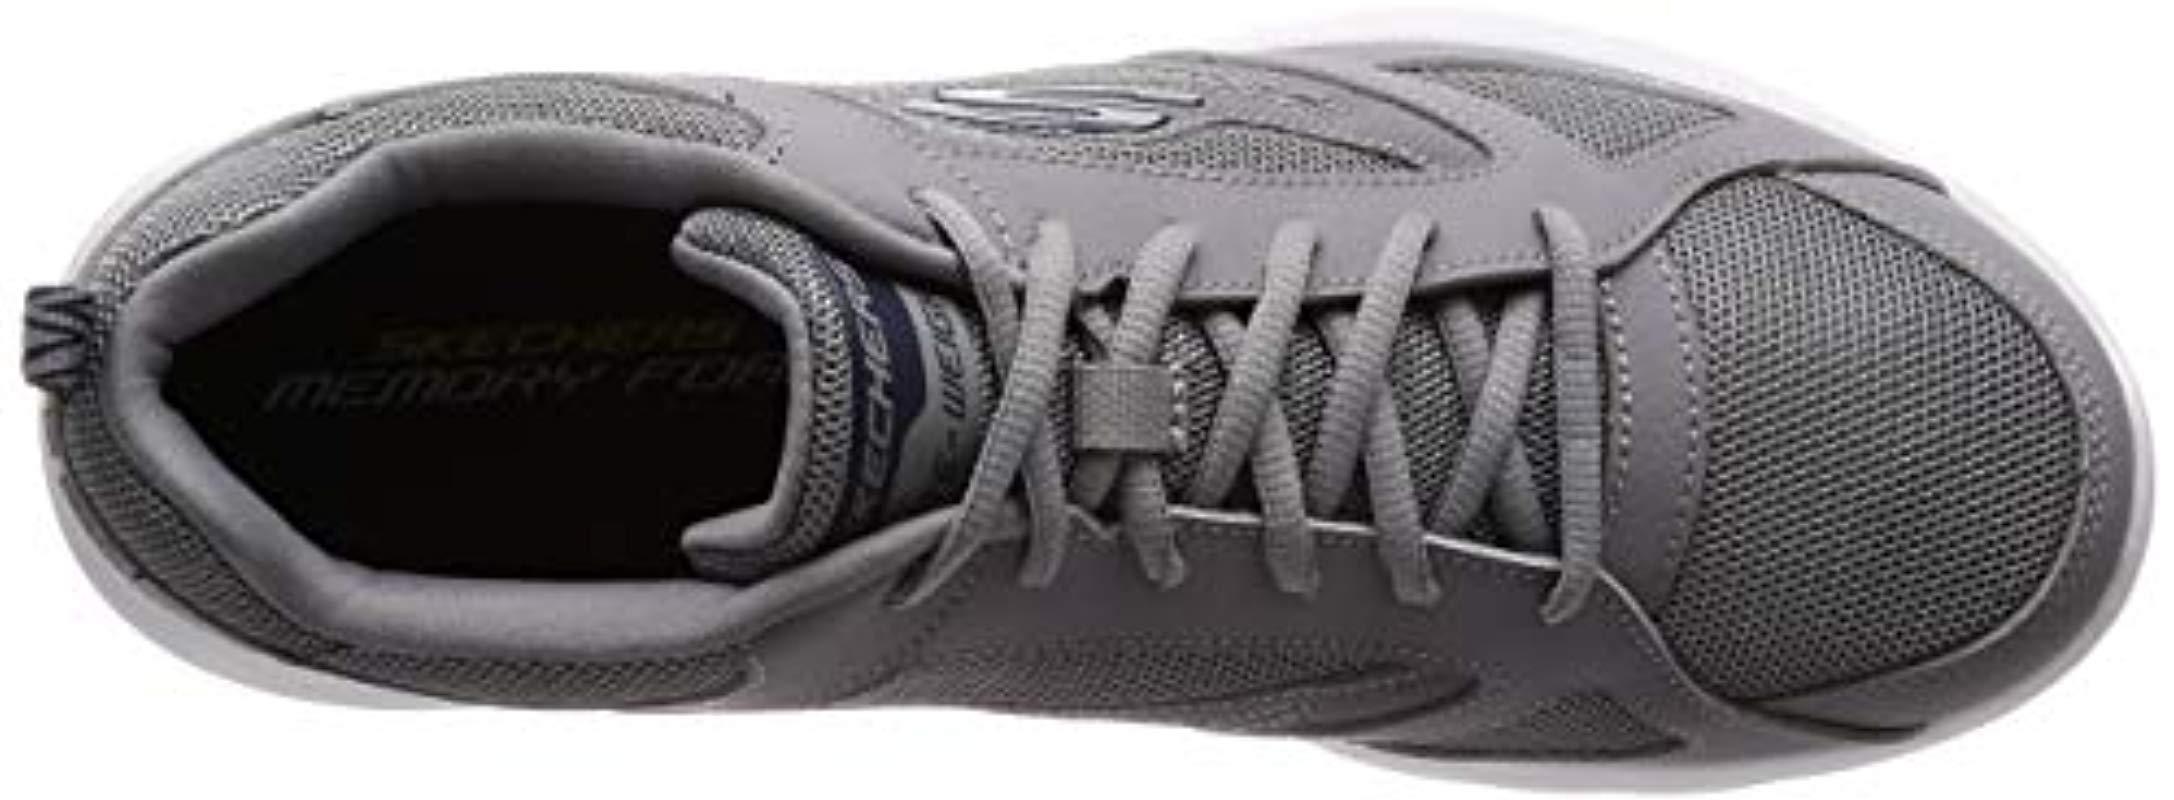 Dynamight 2.0-fallford, Zapatillas para Hombre, Gris (Gray Leather/Mesh/PU/Trim Gry), 40 EU Skechers de hombre